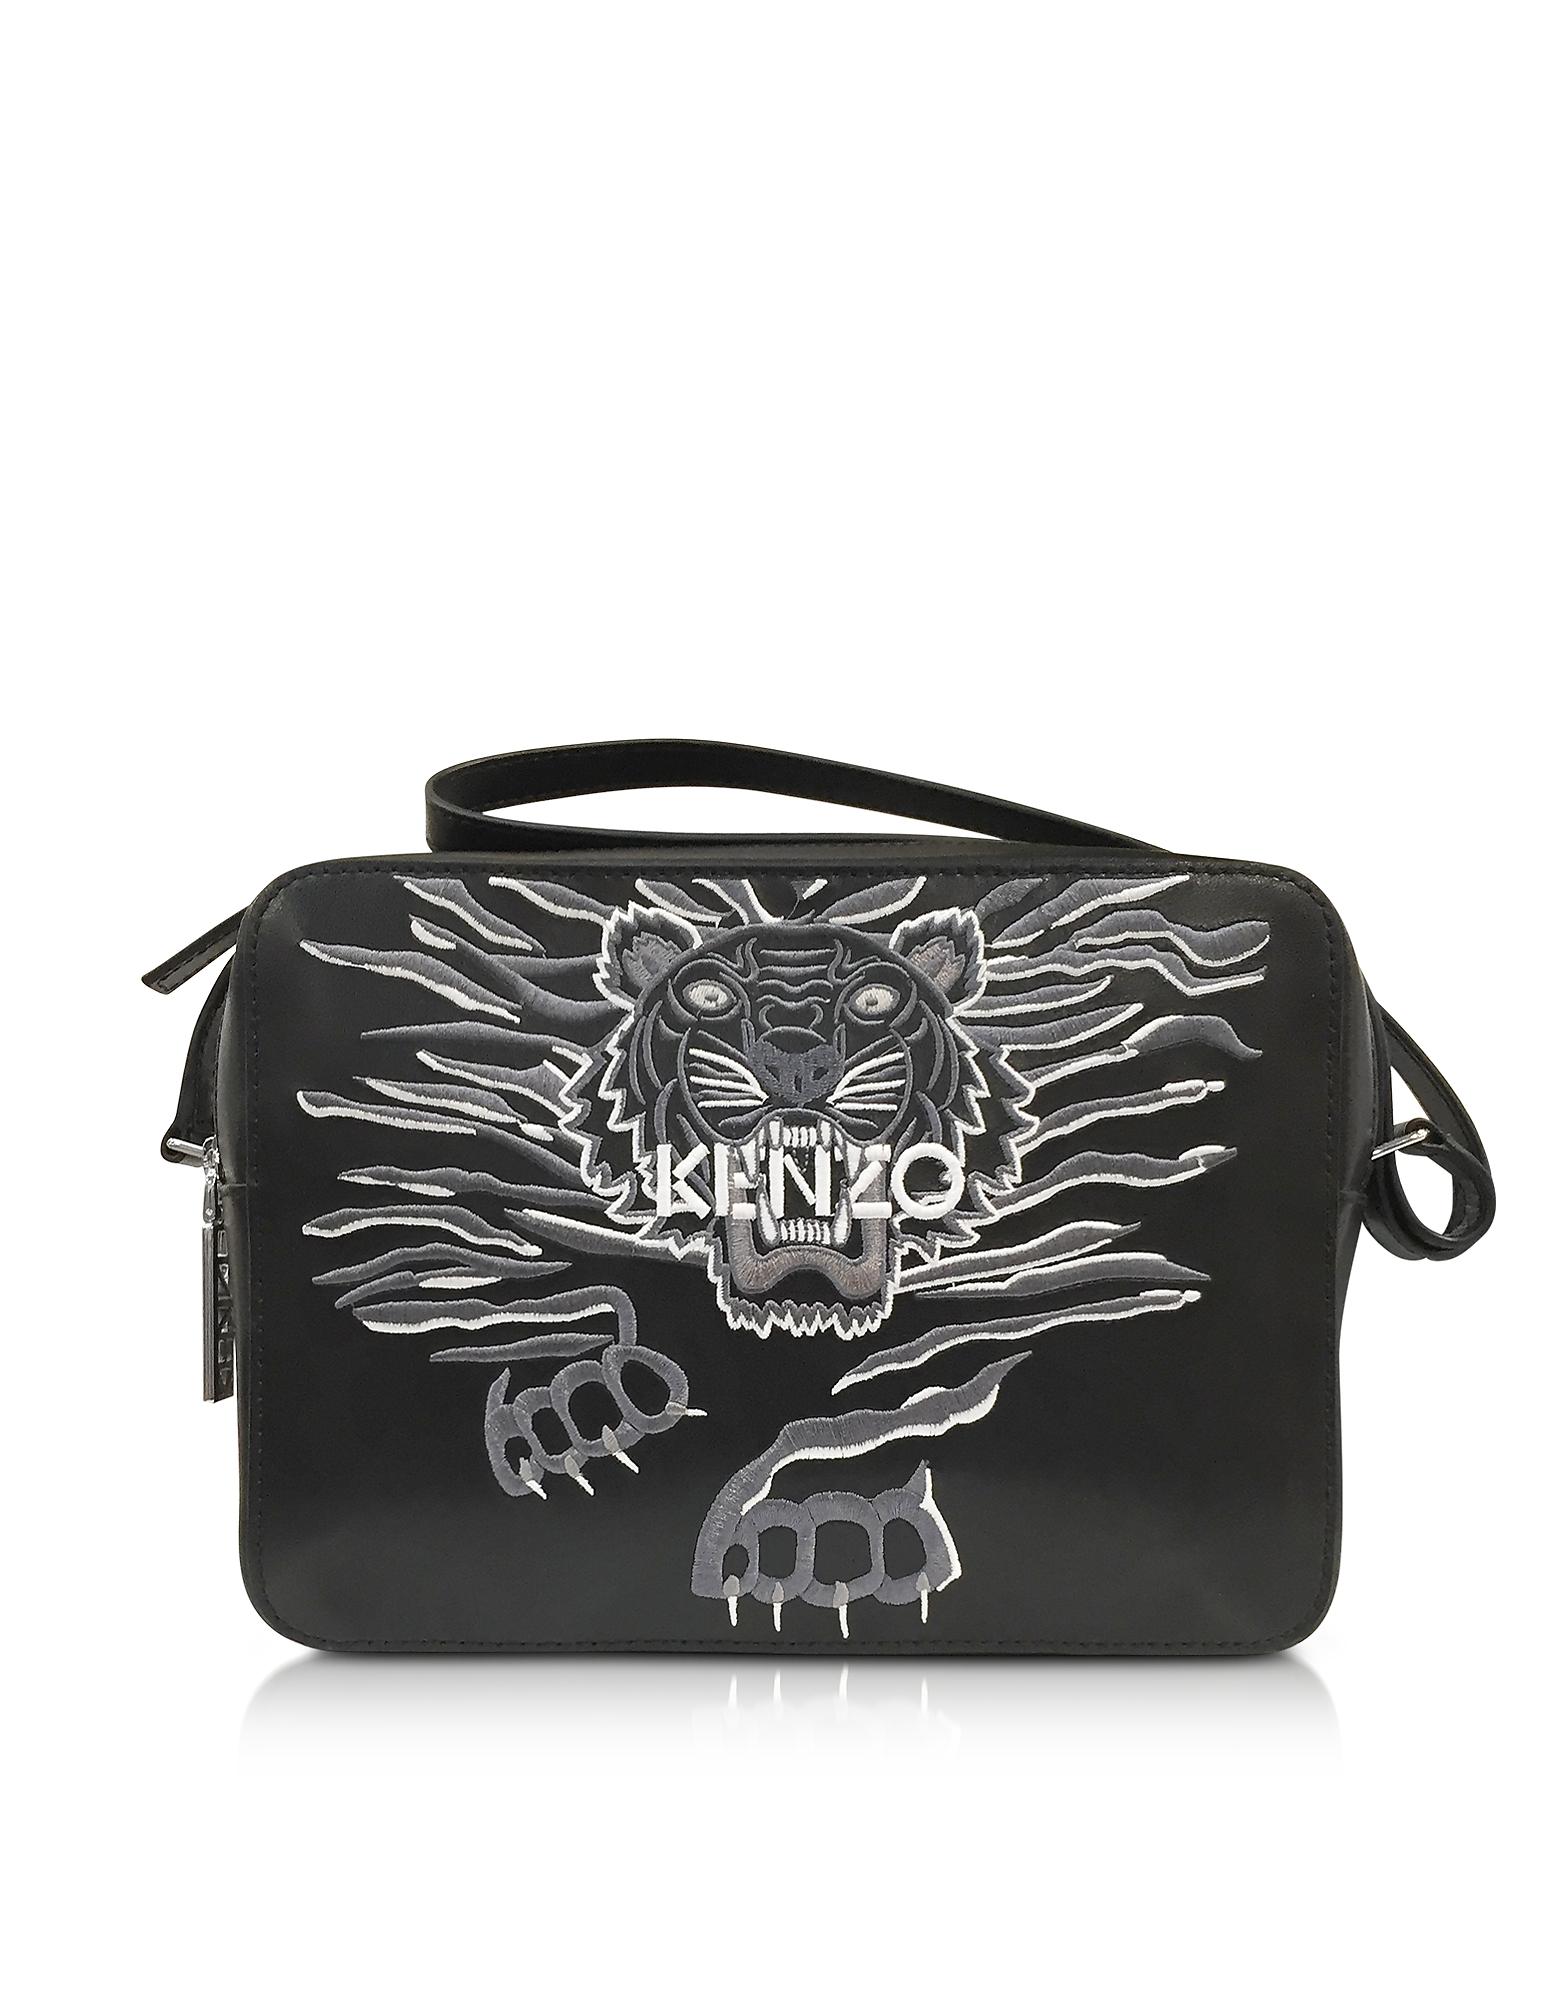 Kenzo Handbags, Black Leather Large Geo Tiger Crossbody Bag